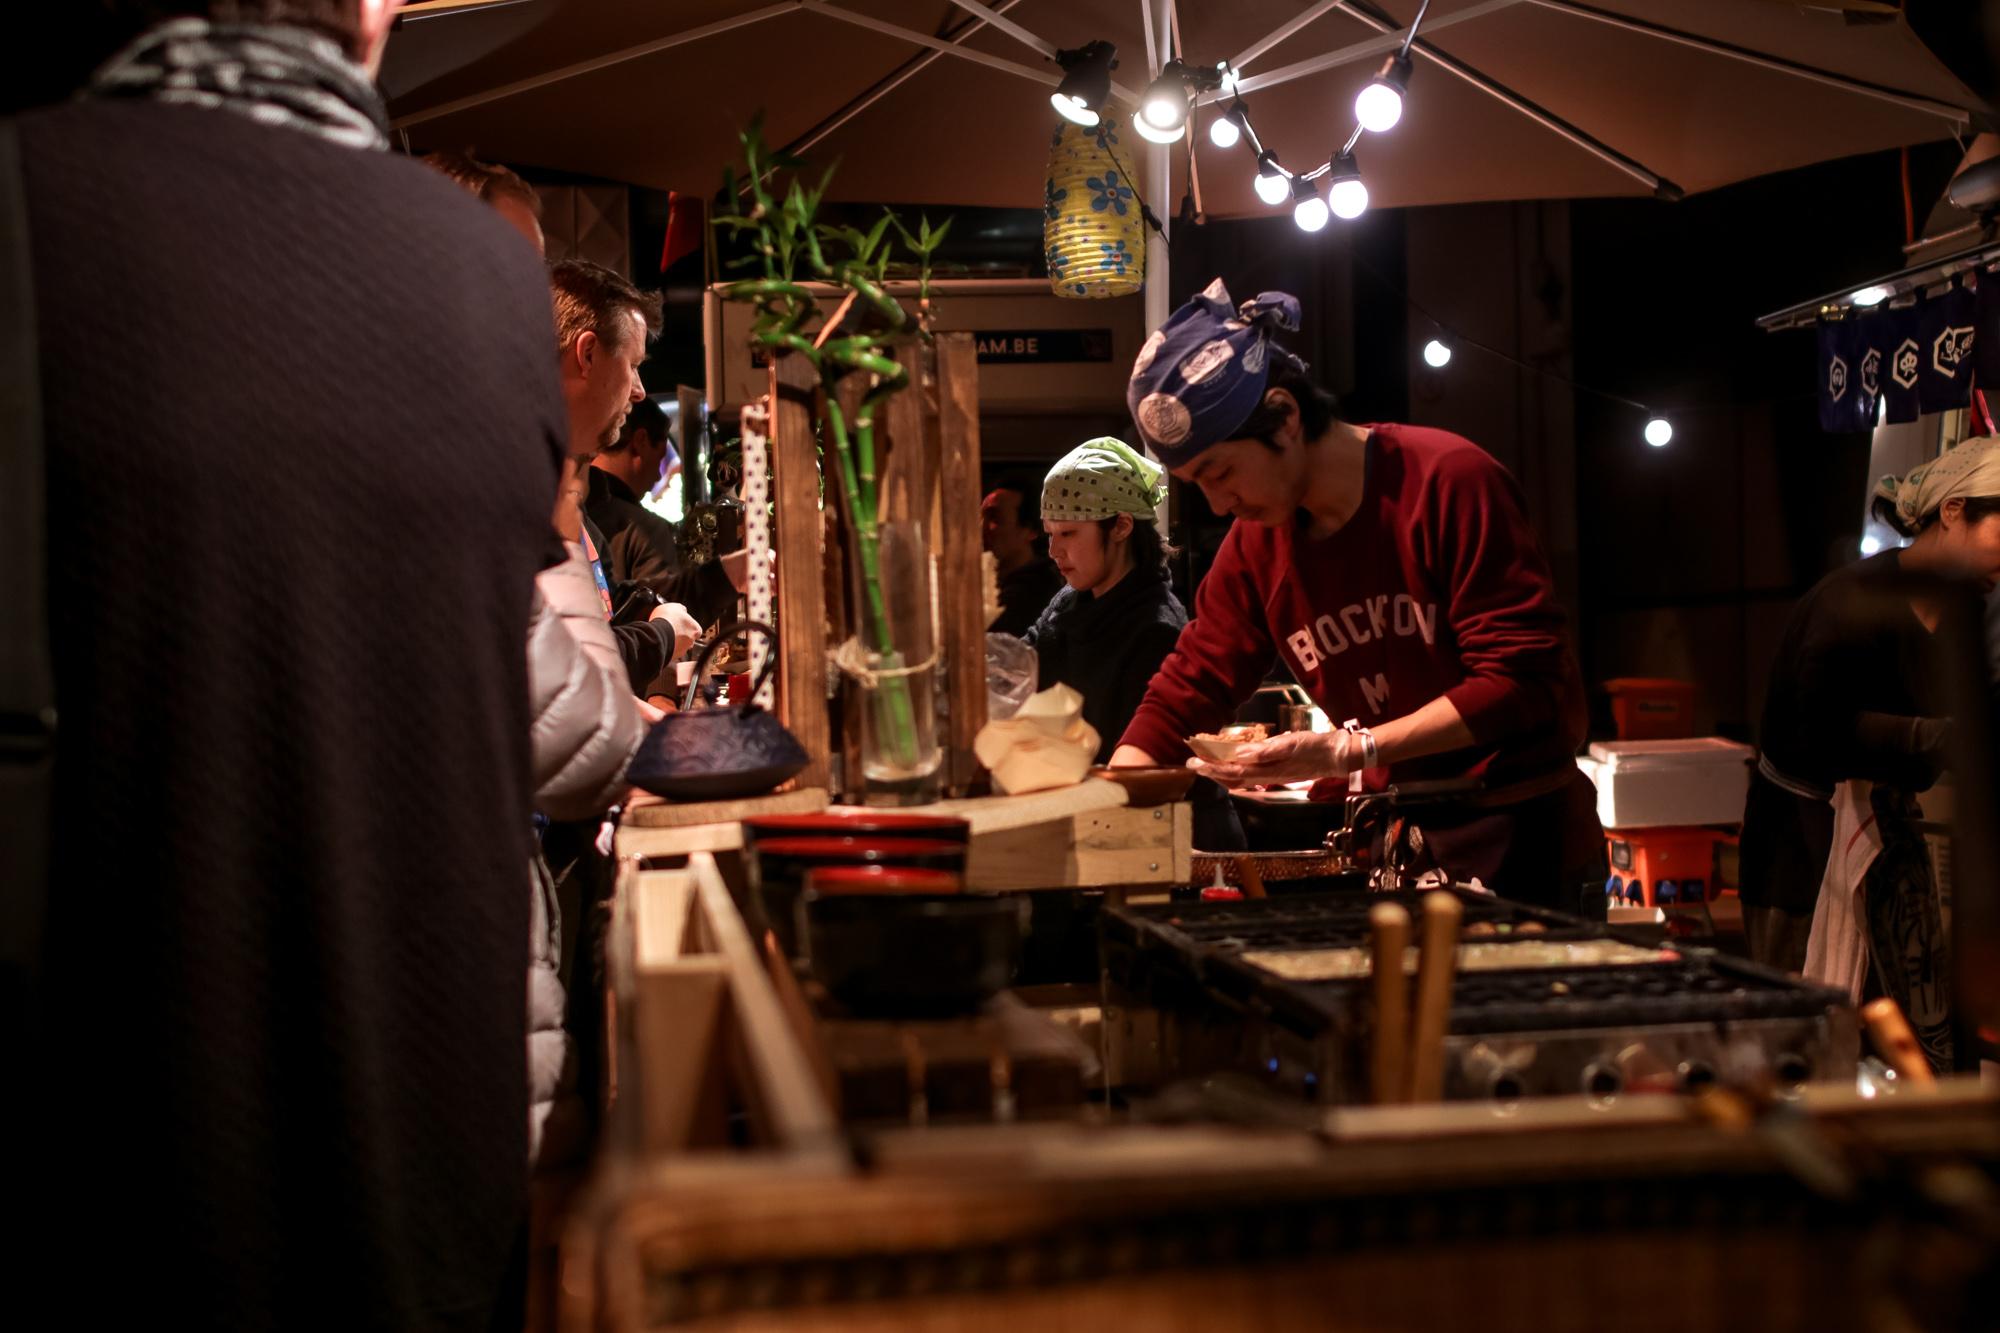 deschuurr-sushi-festival-eindhoven-18